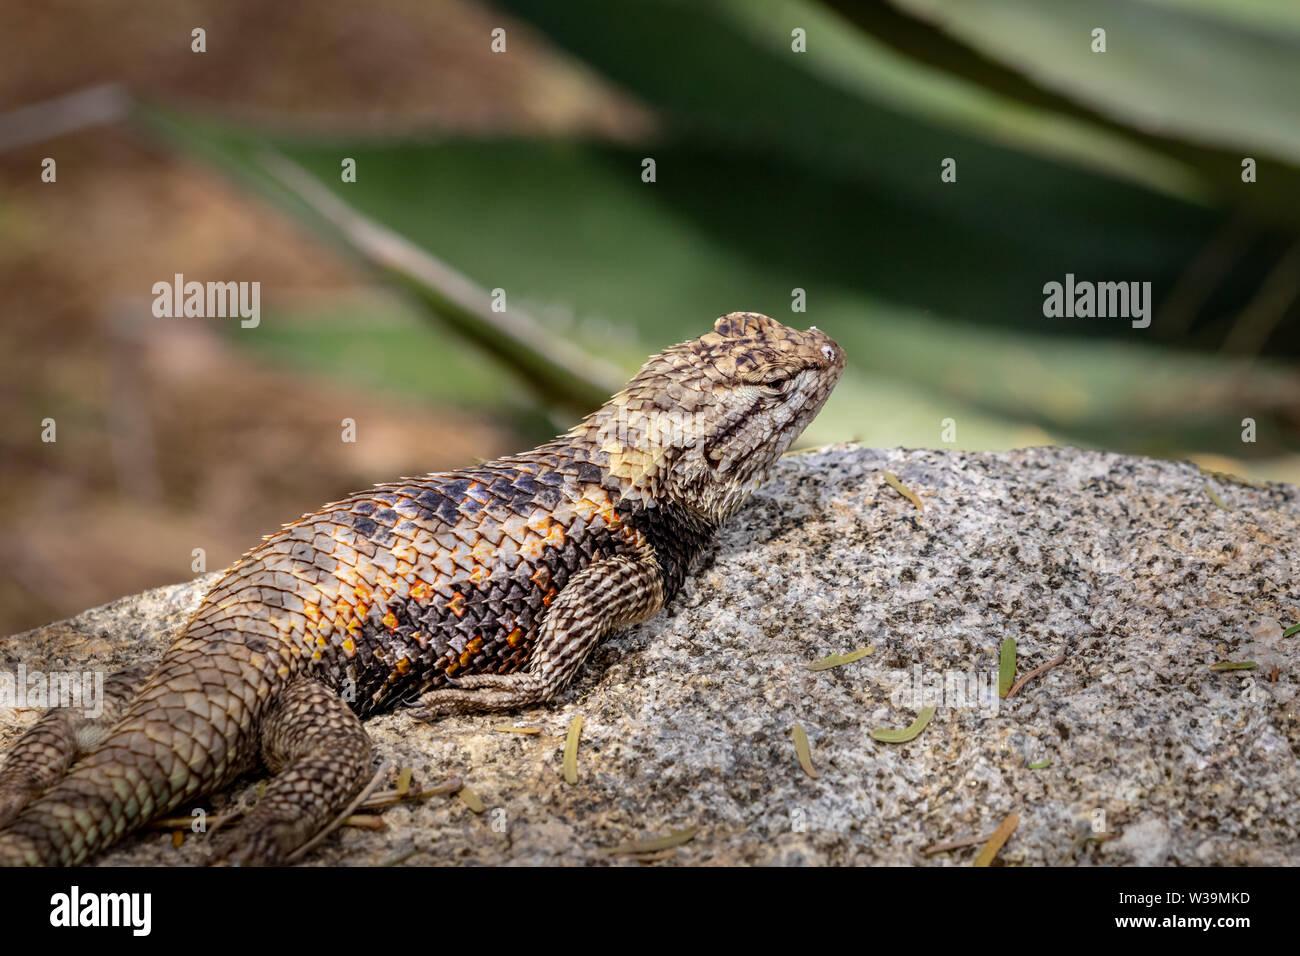 A Desert spiny lizard warms itself in the morning sun. Phoenix Desert Botanical Garden, Arizona, USA. Stock Photo